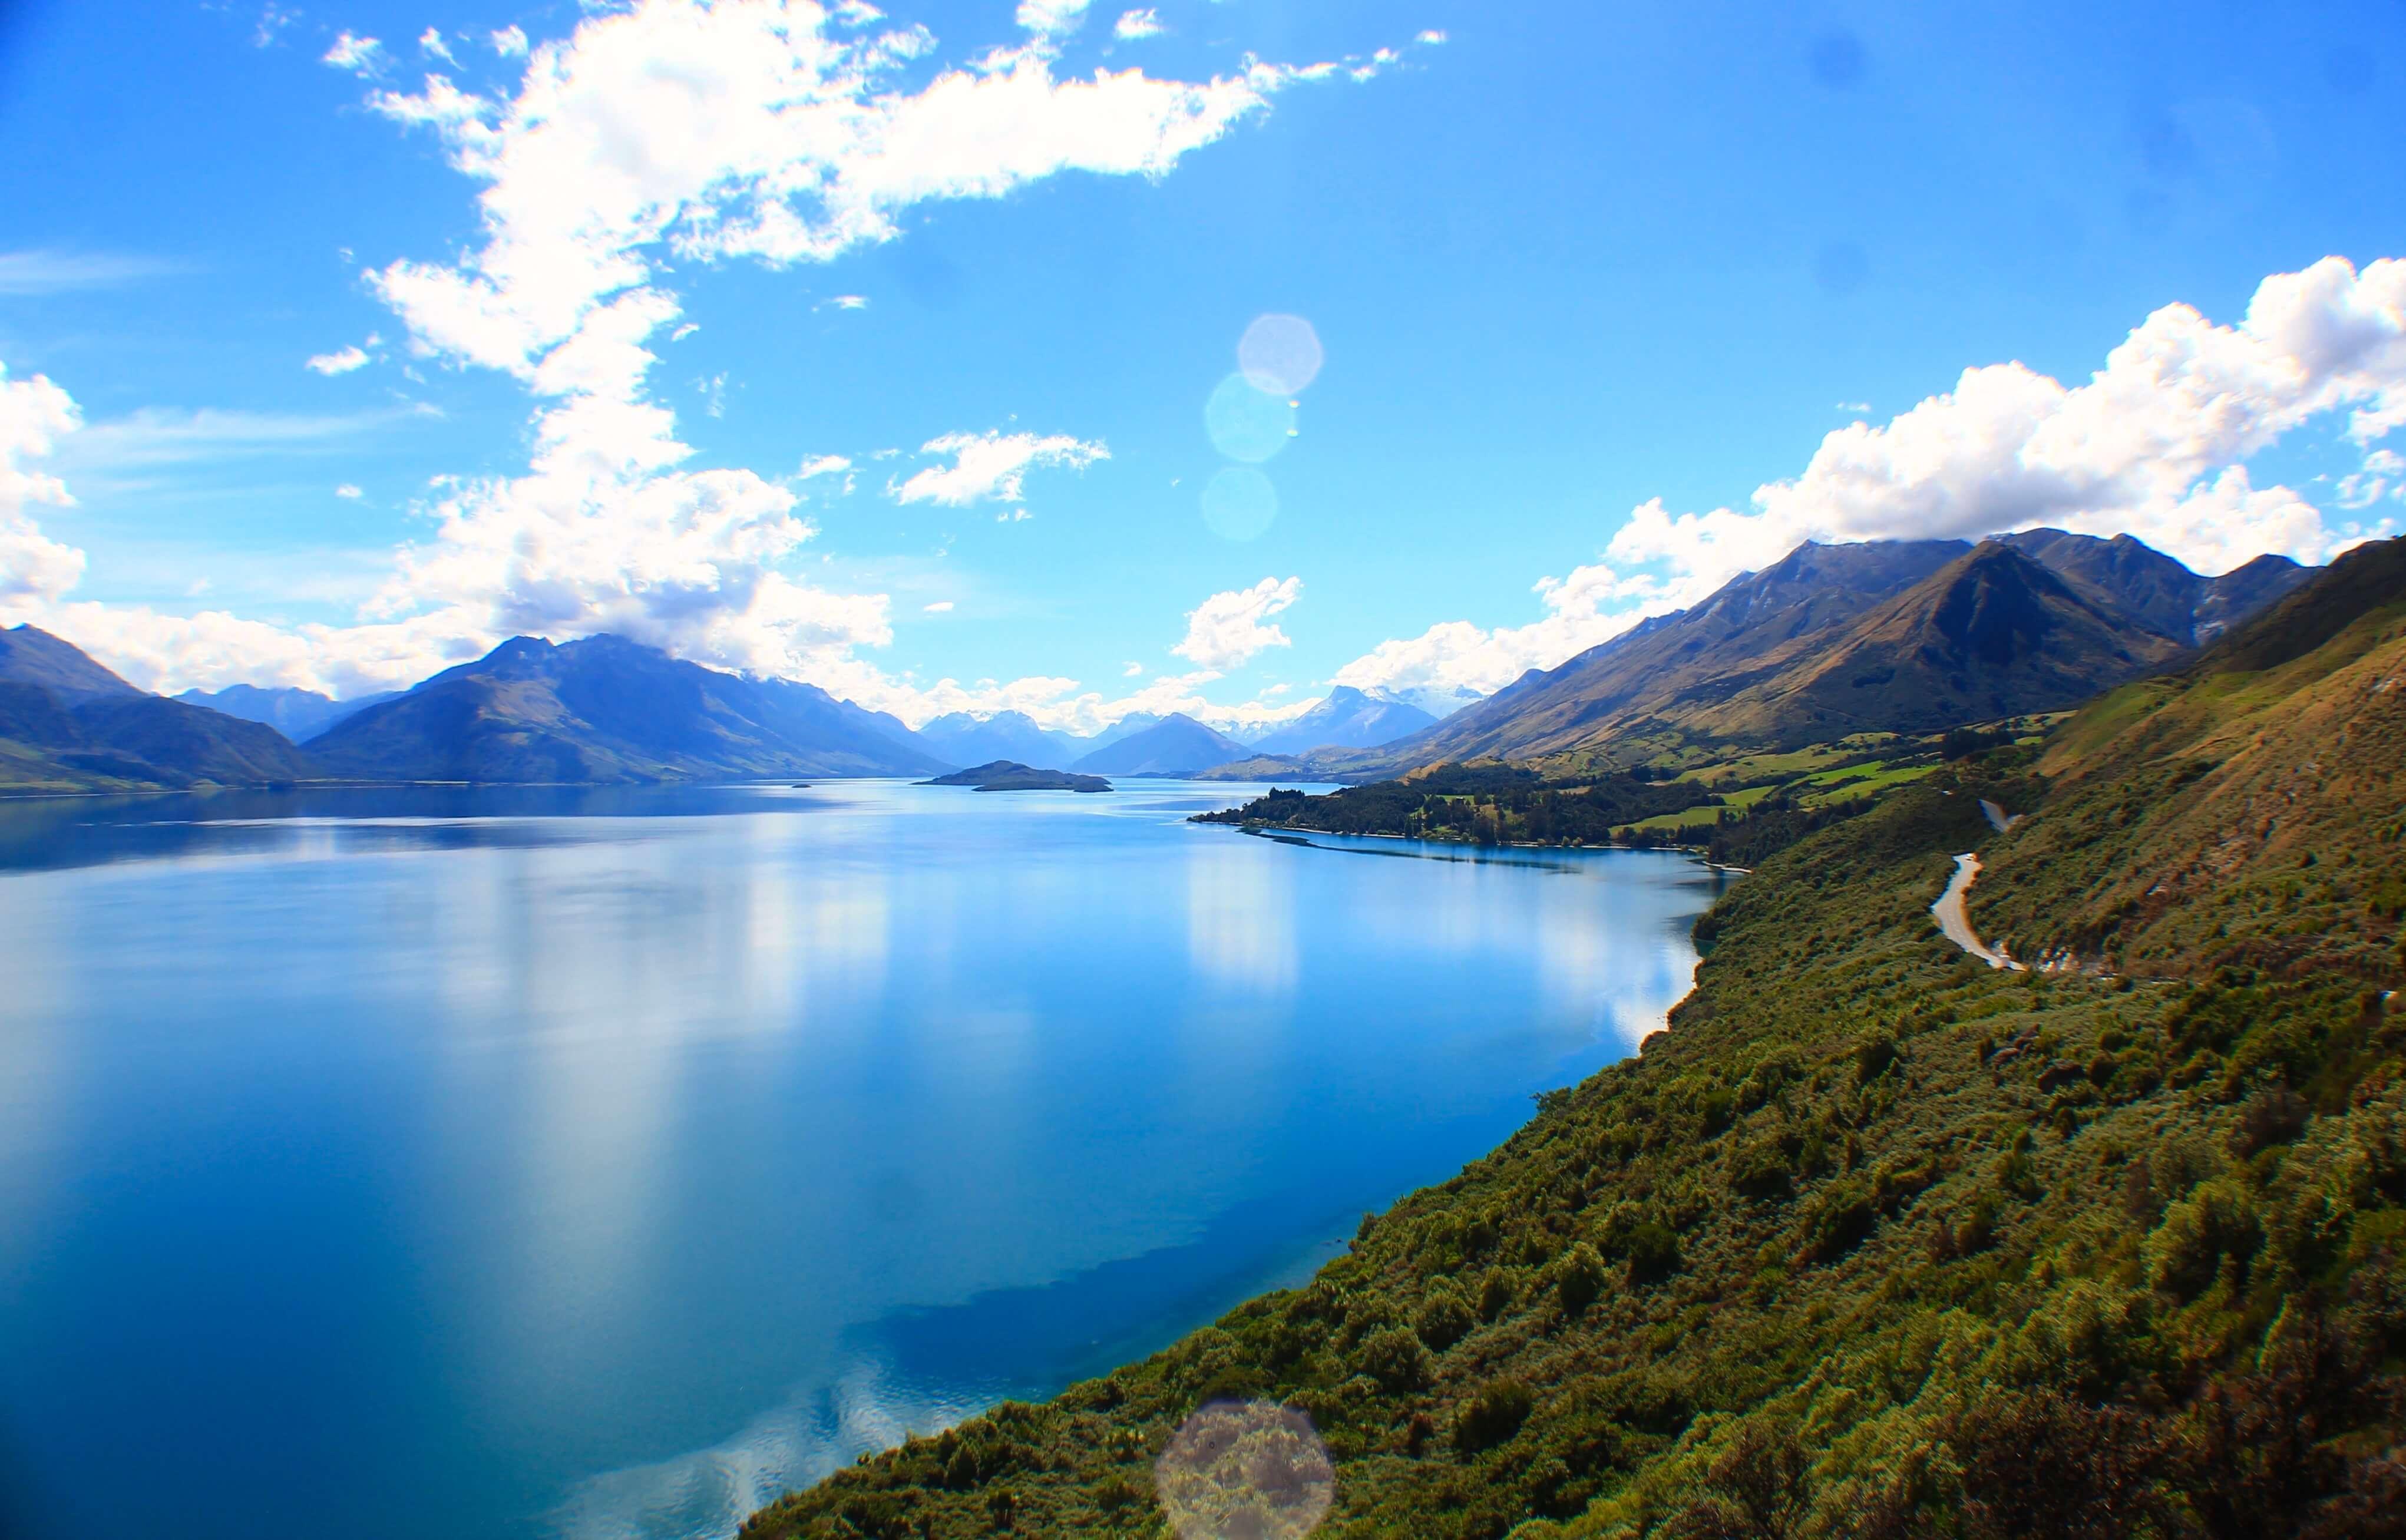 Mountains around Queenstown, 3 week New Zealand Road Trip Itinerary